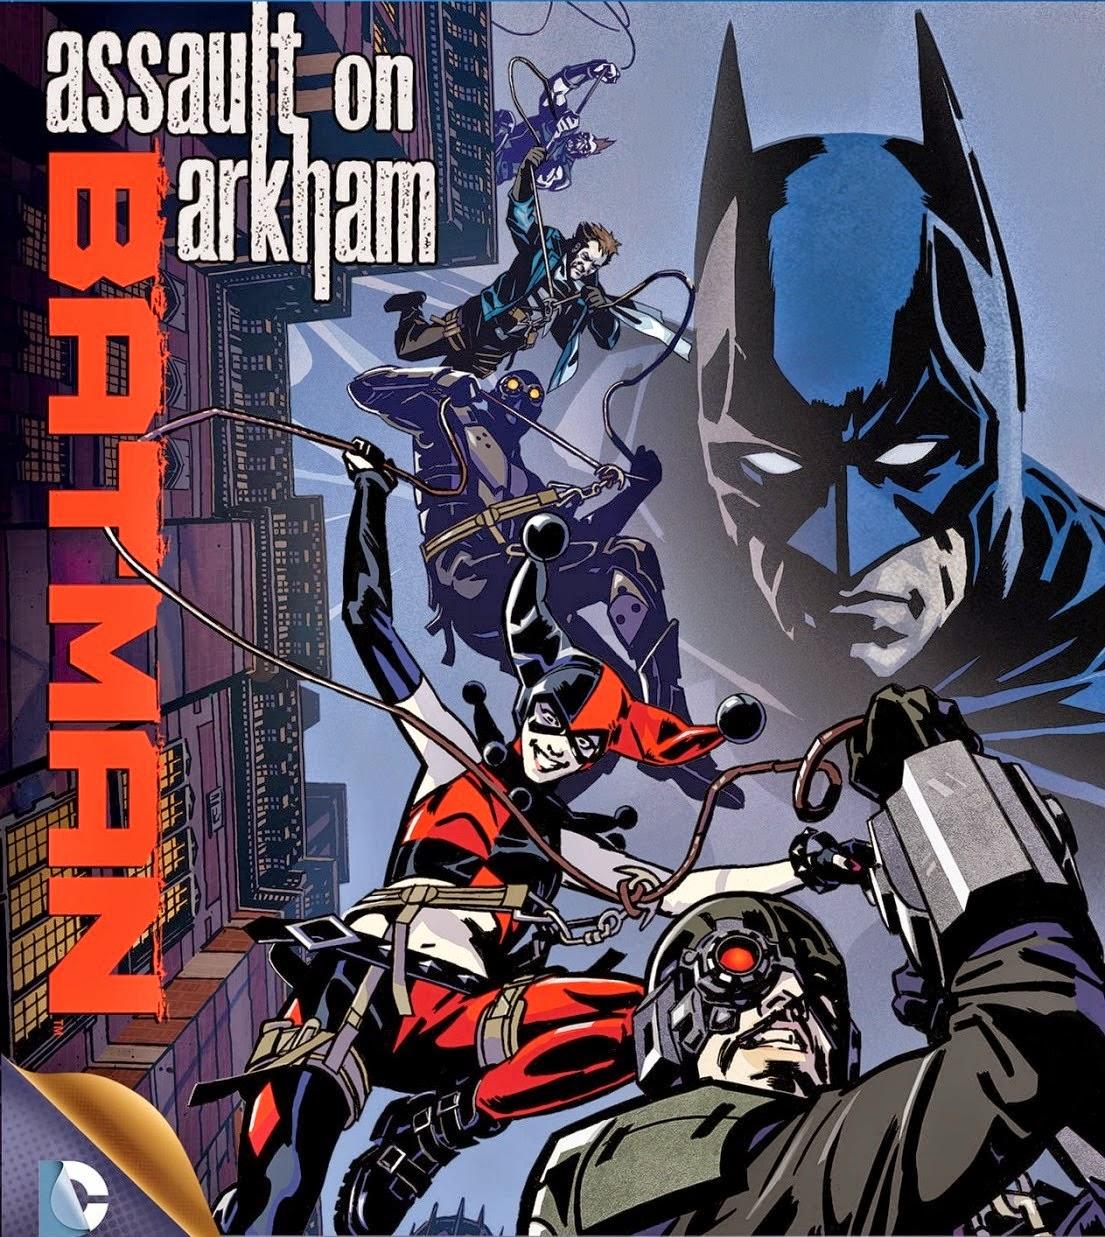 Batman Assault on Arkham (2014) แบทแมน ยุทธการถล่มอาร์คแคม Full HD มาสเตอร์ พากย์ไทย